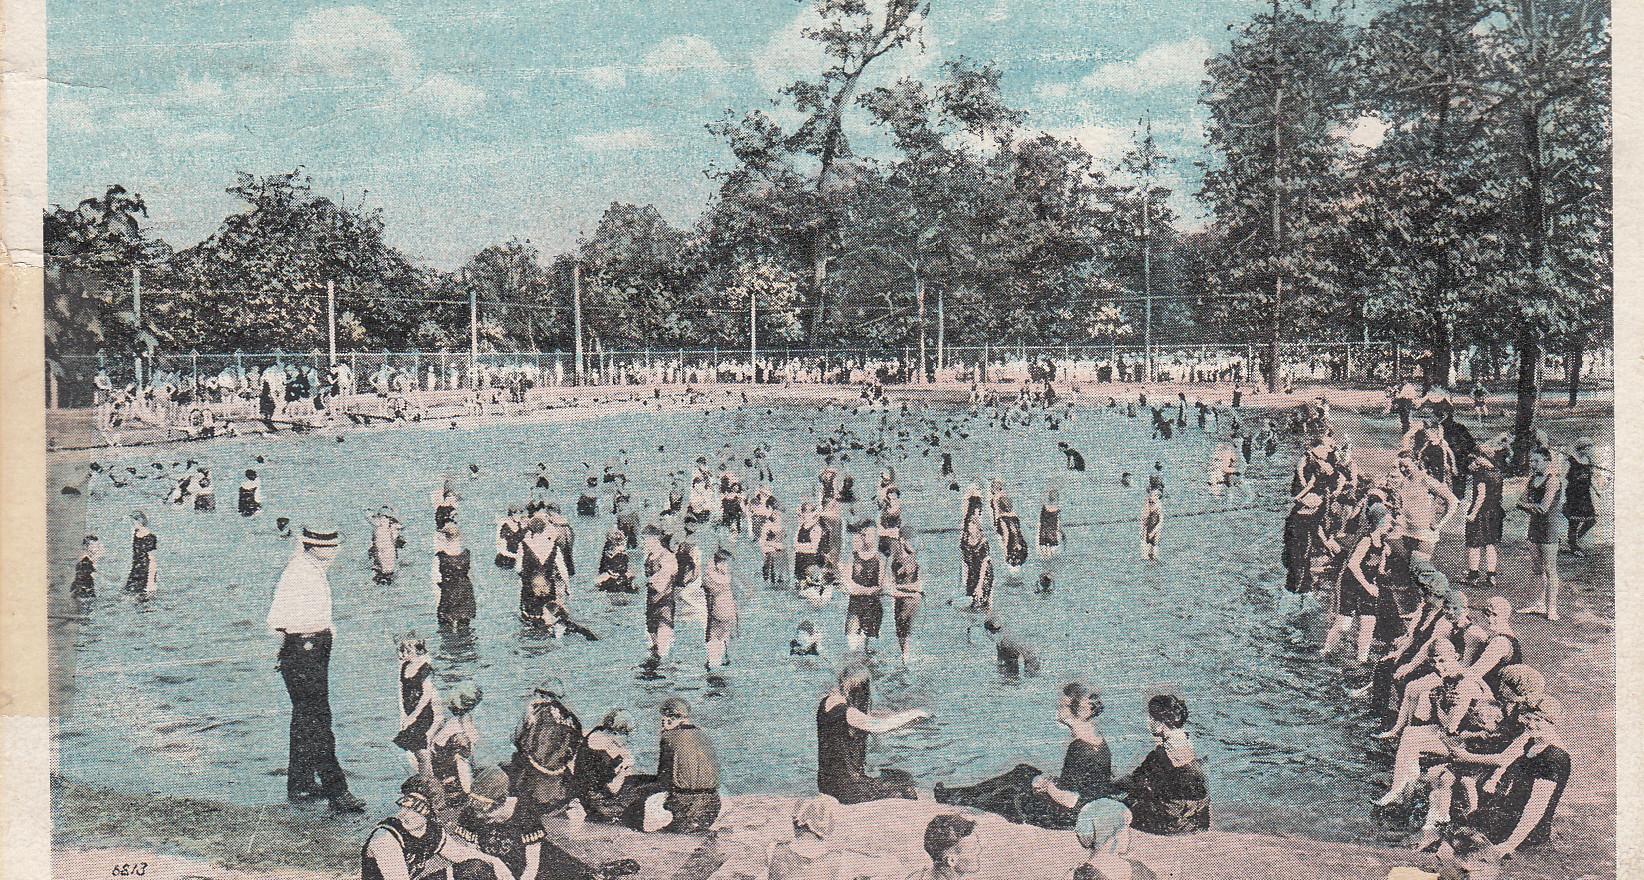 Swimming pool in Garfield Park 1921.jpg